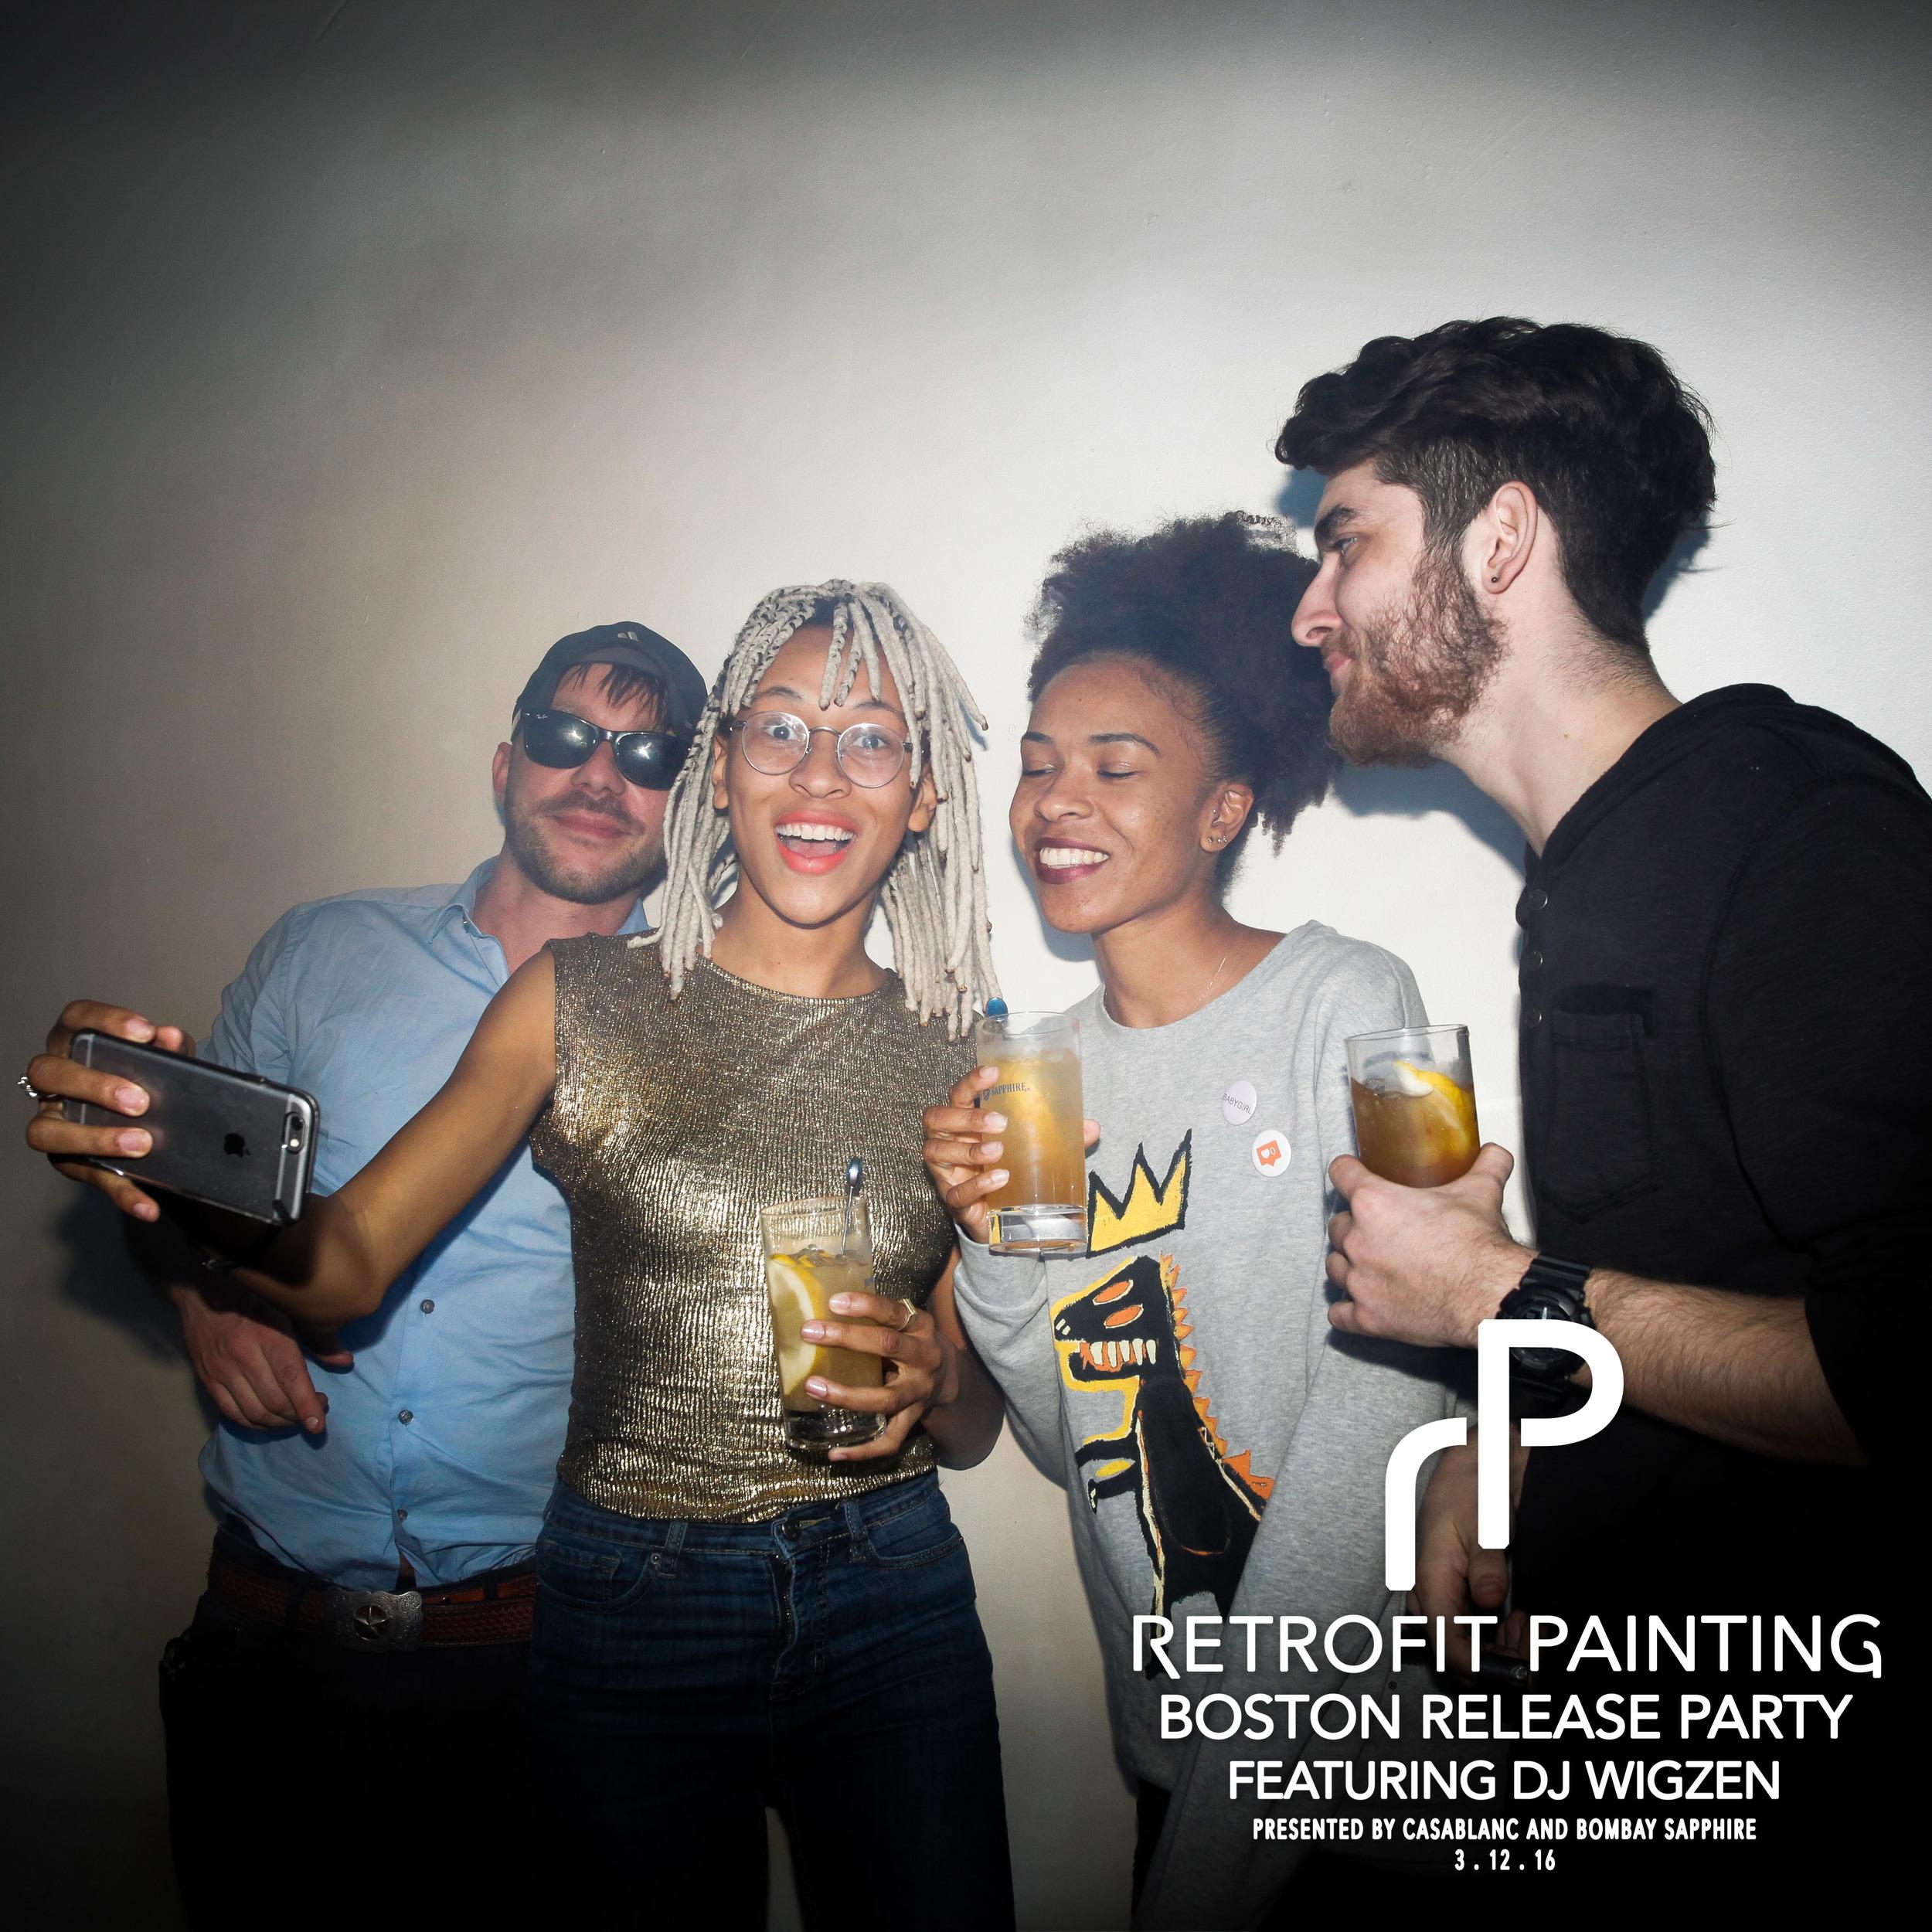 Retrofit Painting Boston Release Party 0094.jpg